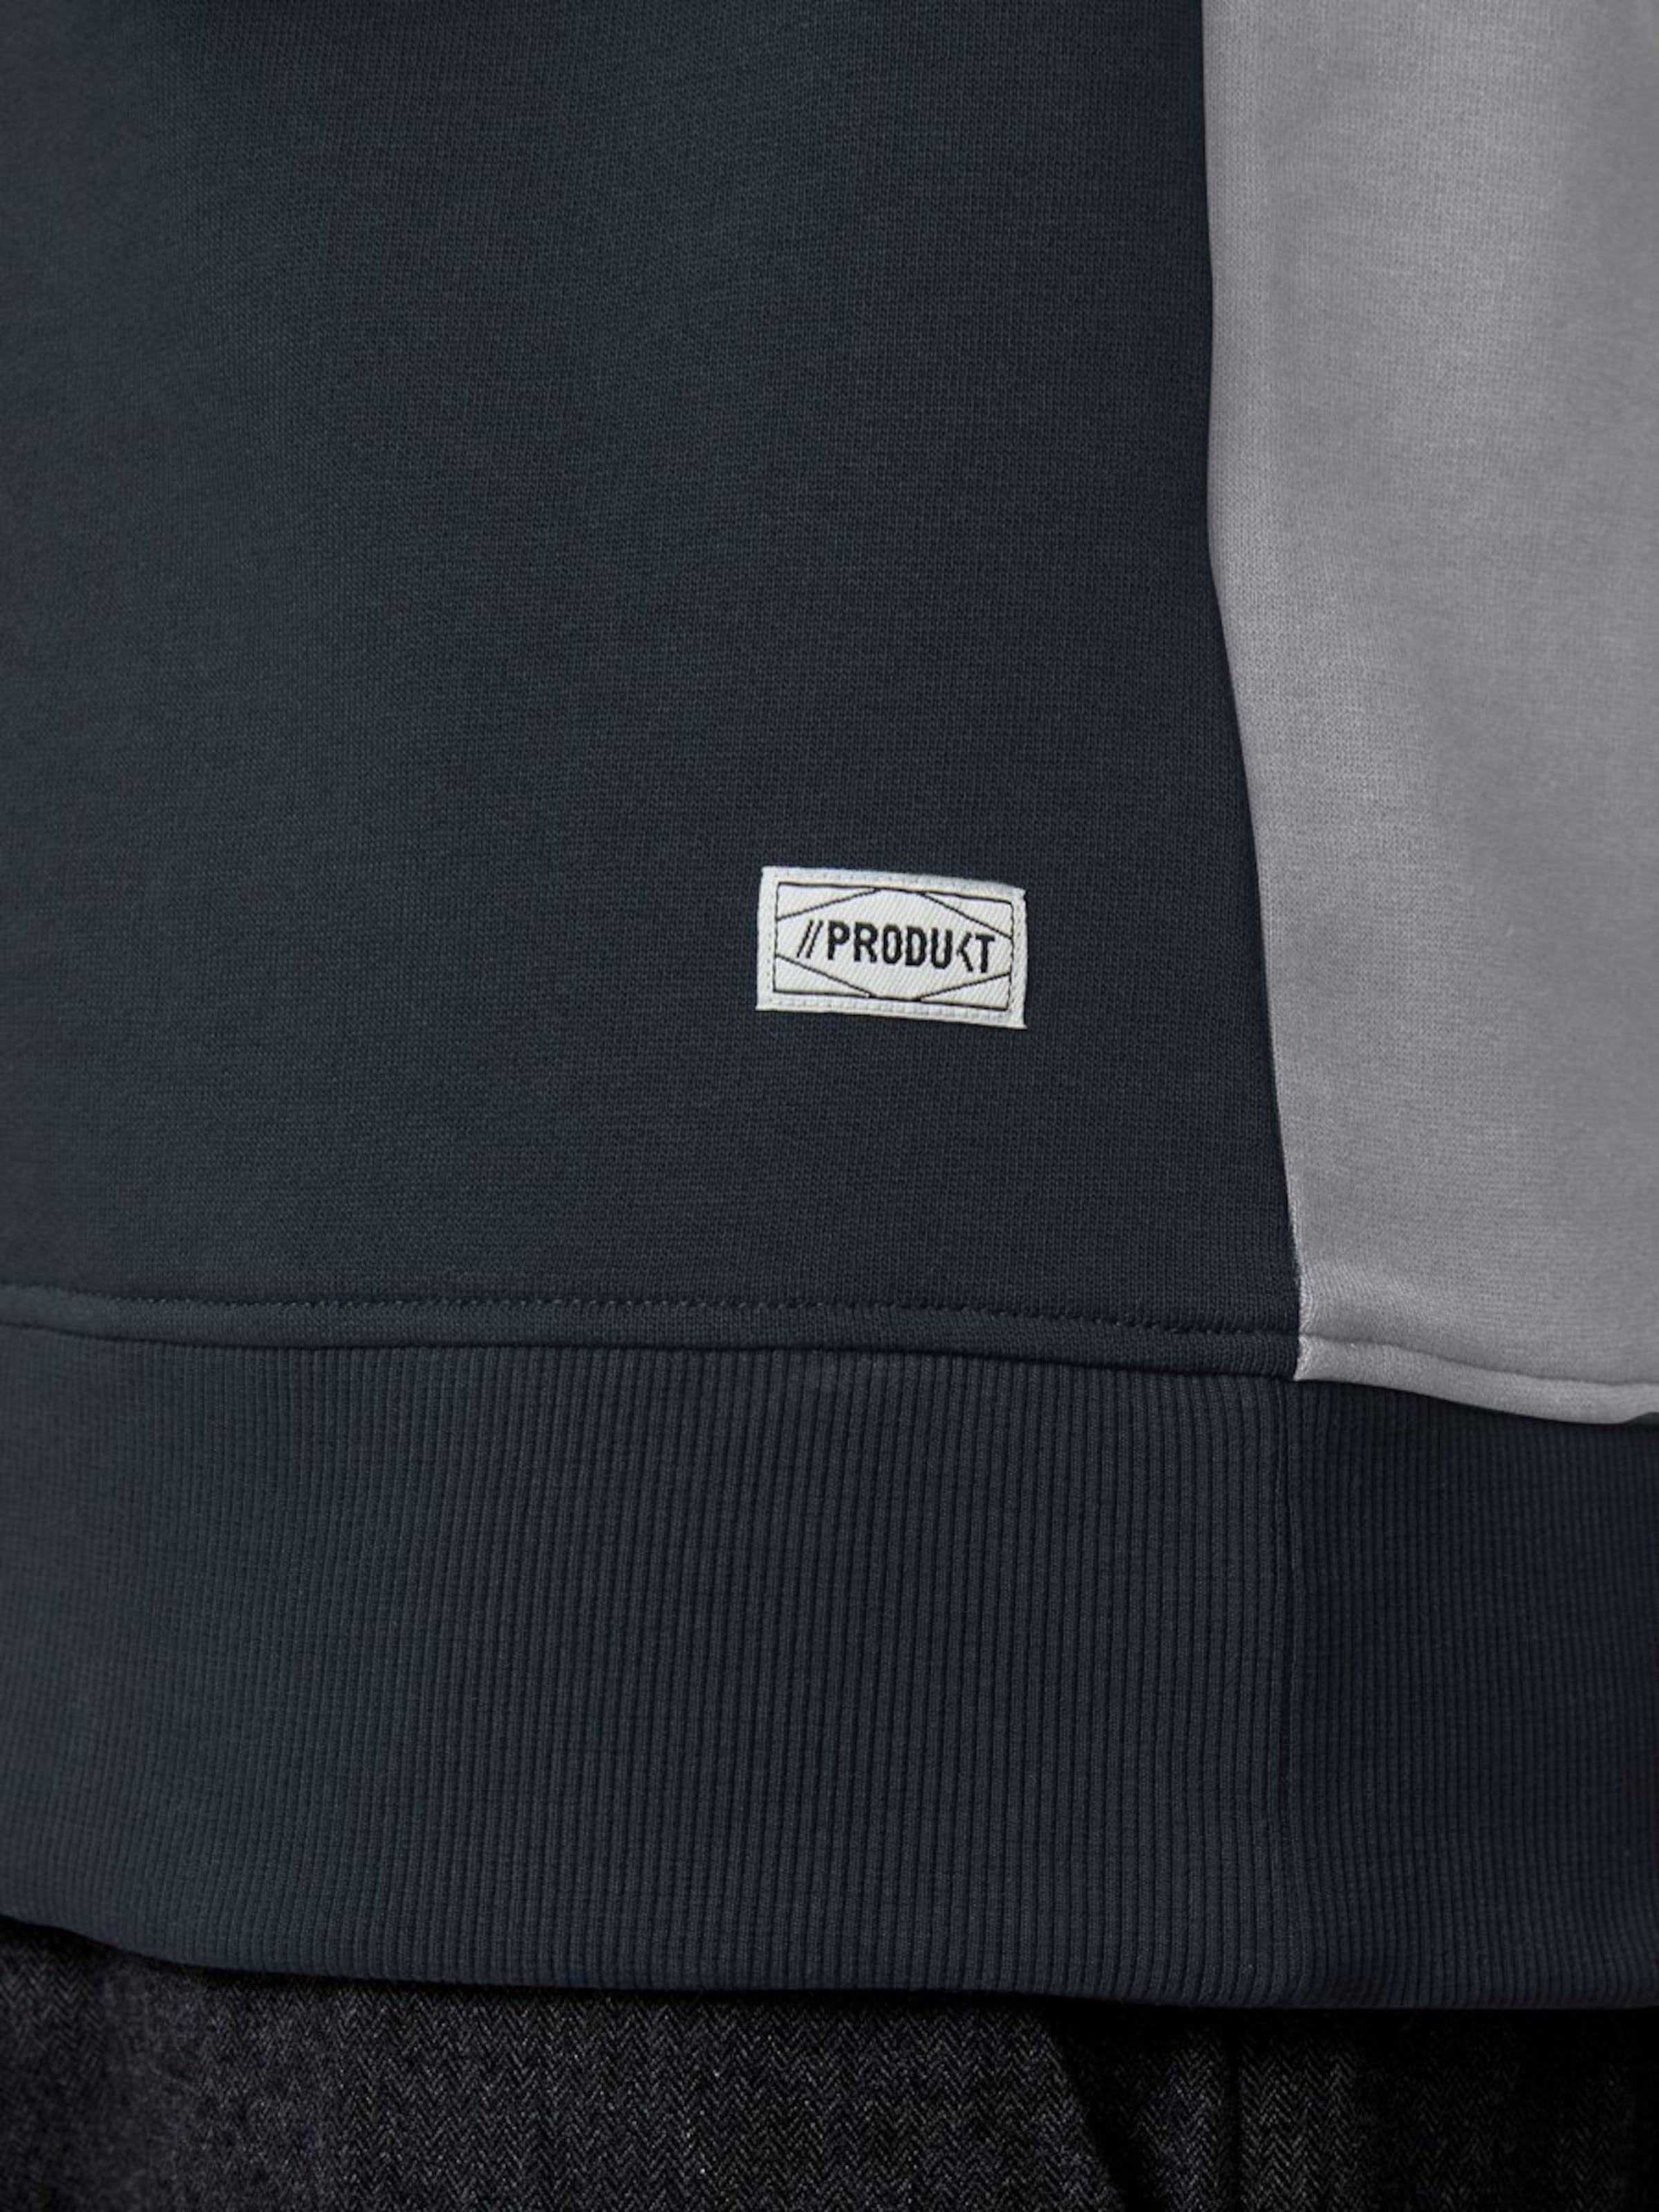 shirt En Sweat Chiné FoncéGris Blanc Produkt Bleu gmIf6yYb7v